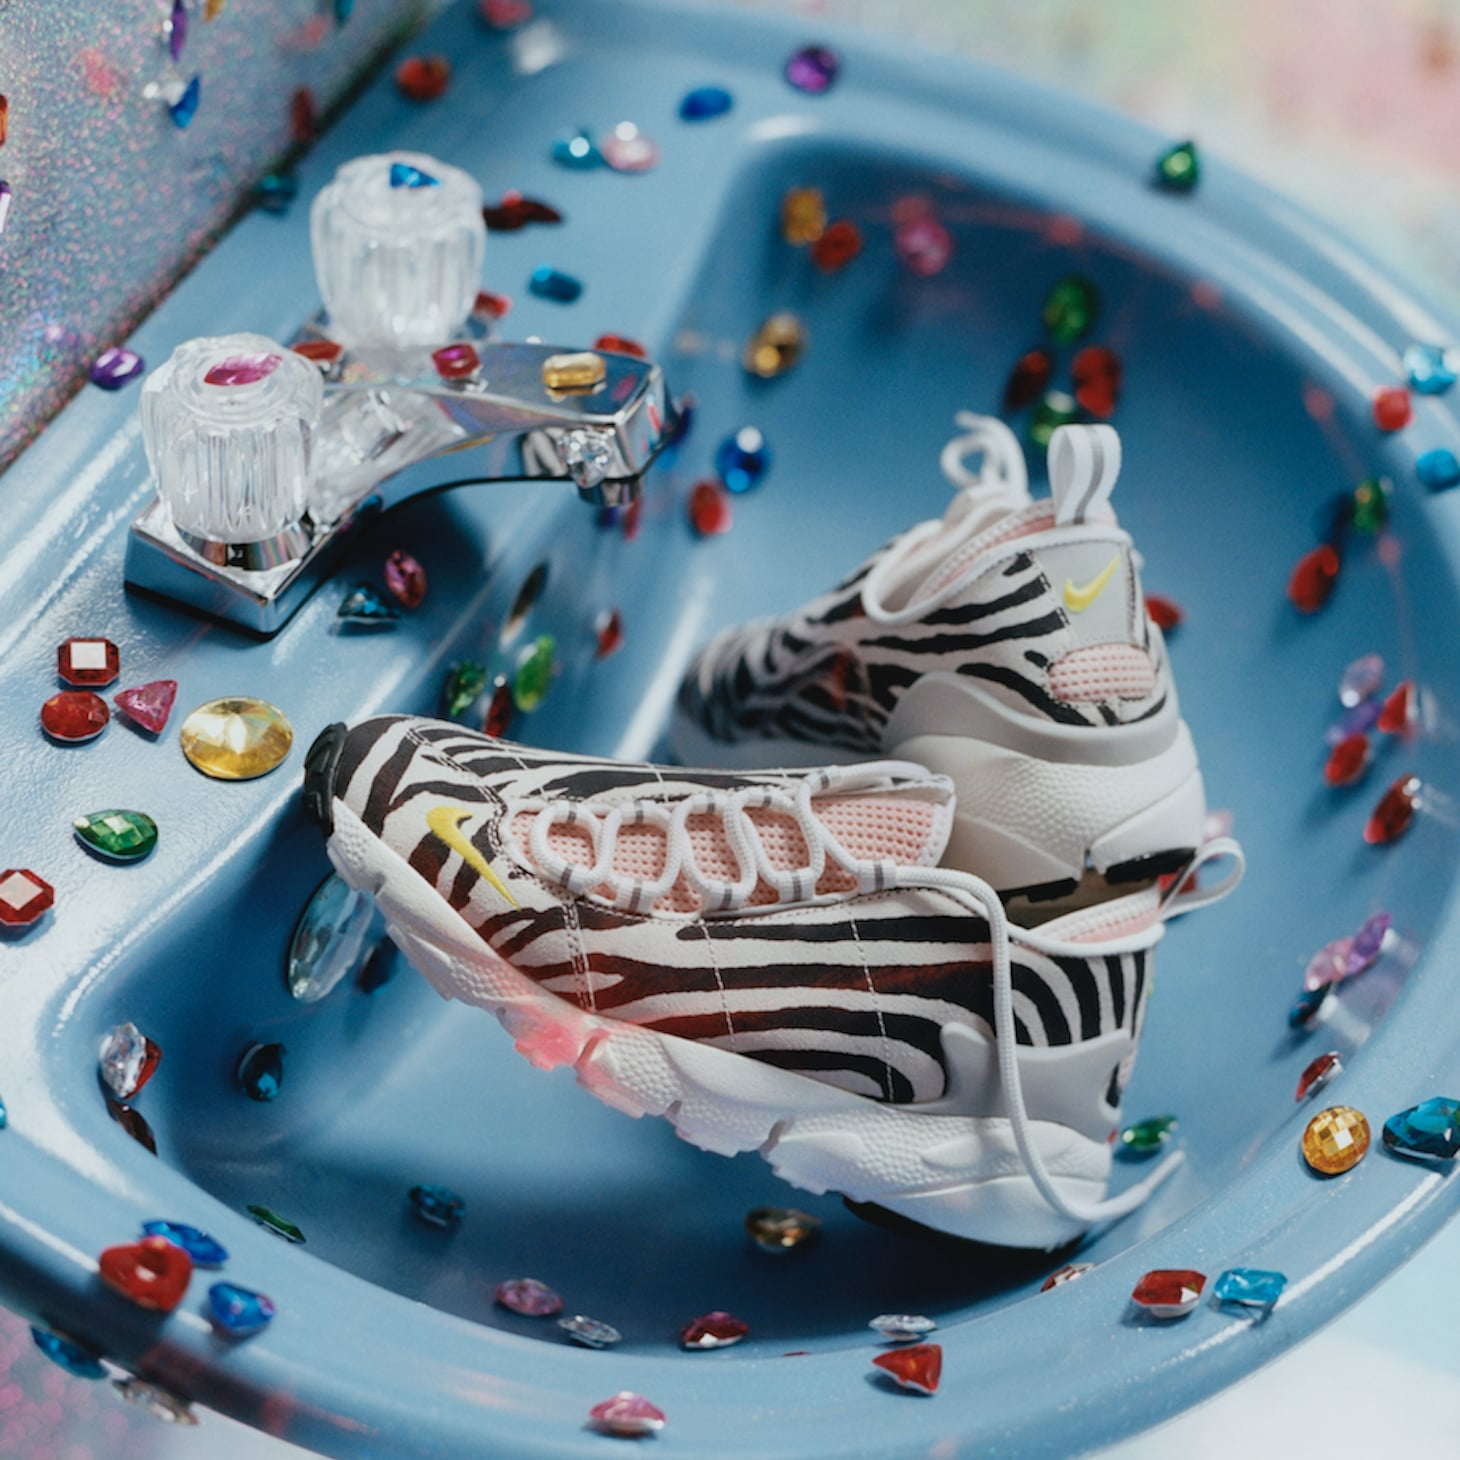 Nike x Olivia Kim Air Max 98 Sneaker | Shop the Nike x